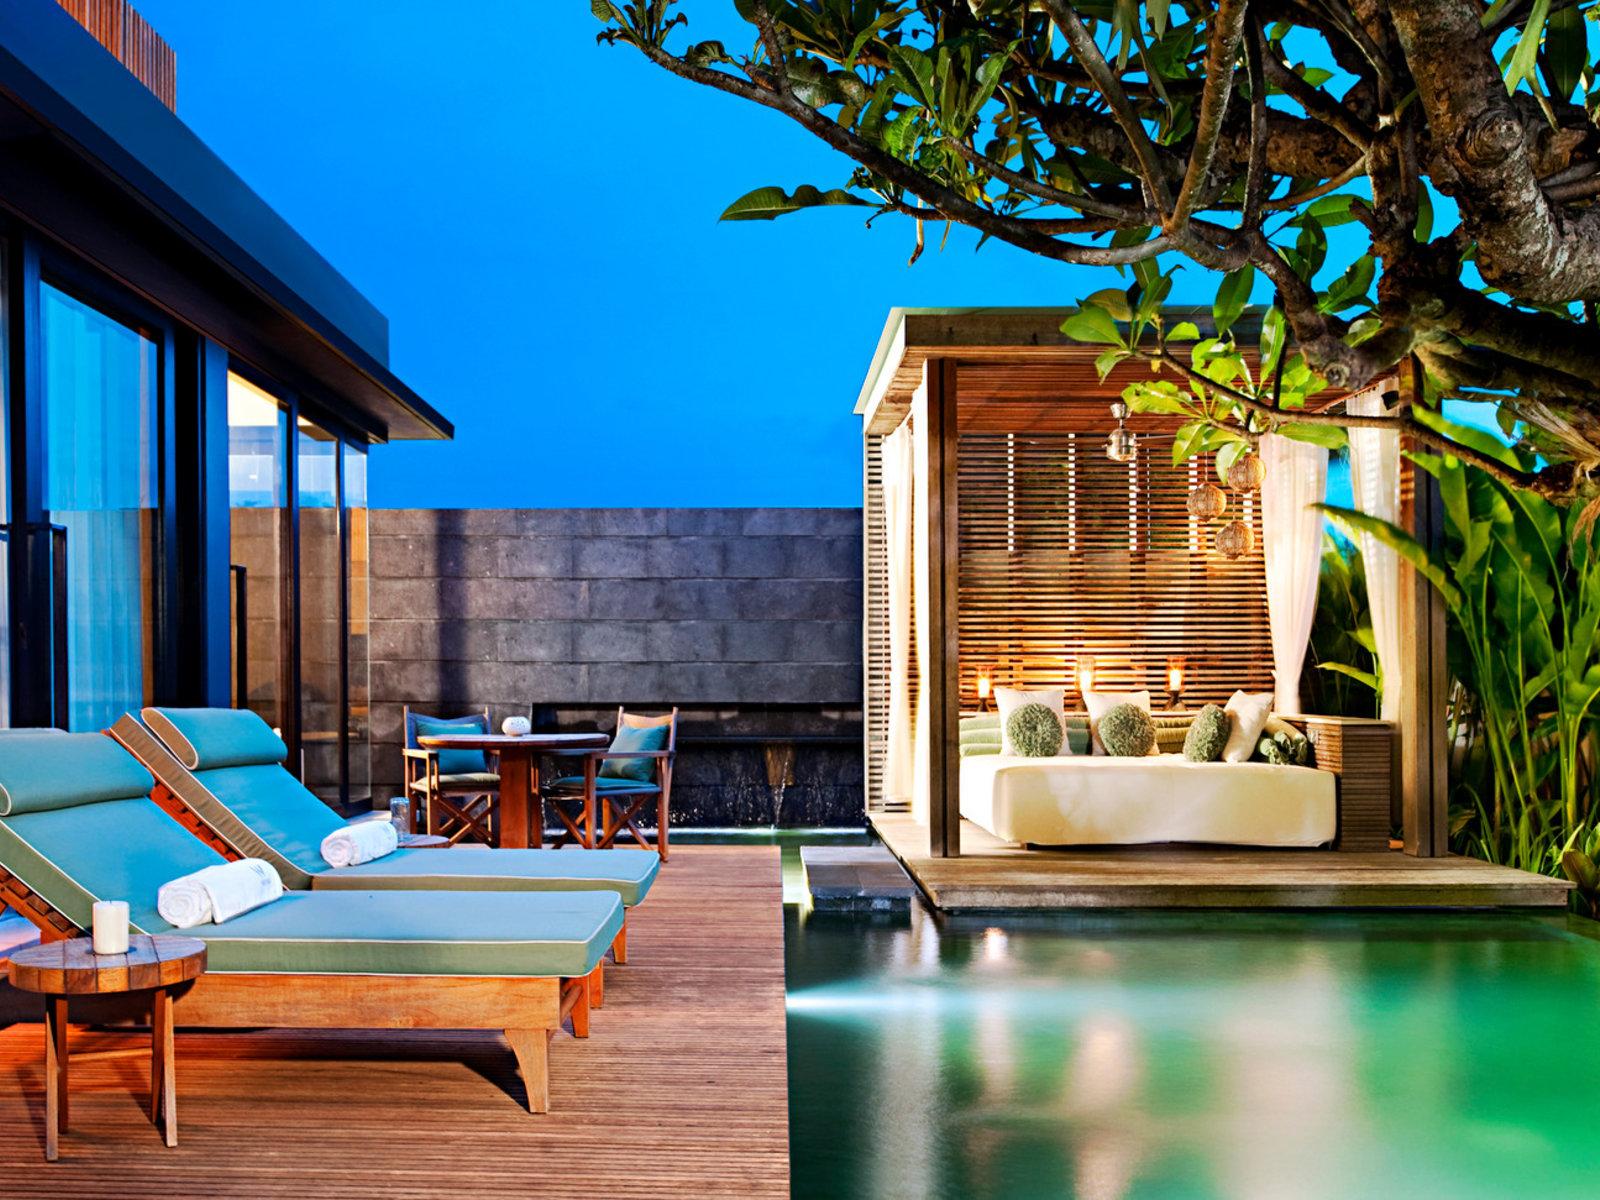 Wohnbeispiel Marvelous One Bedroom Pool Villa